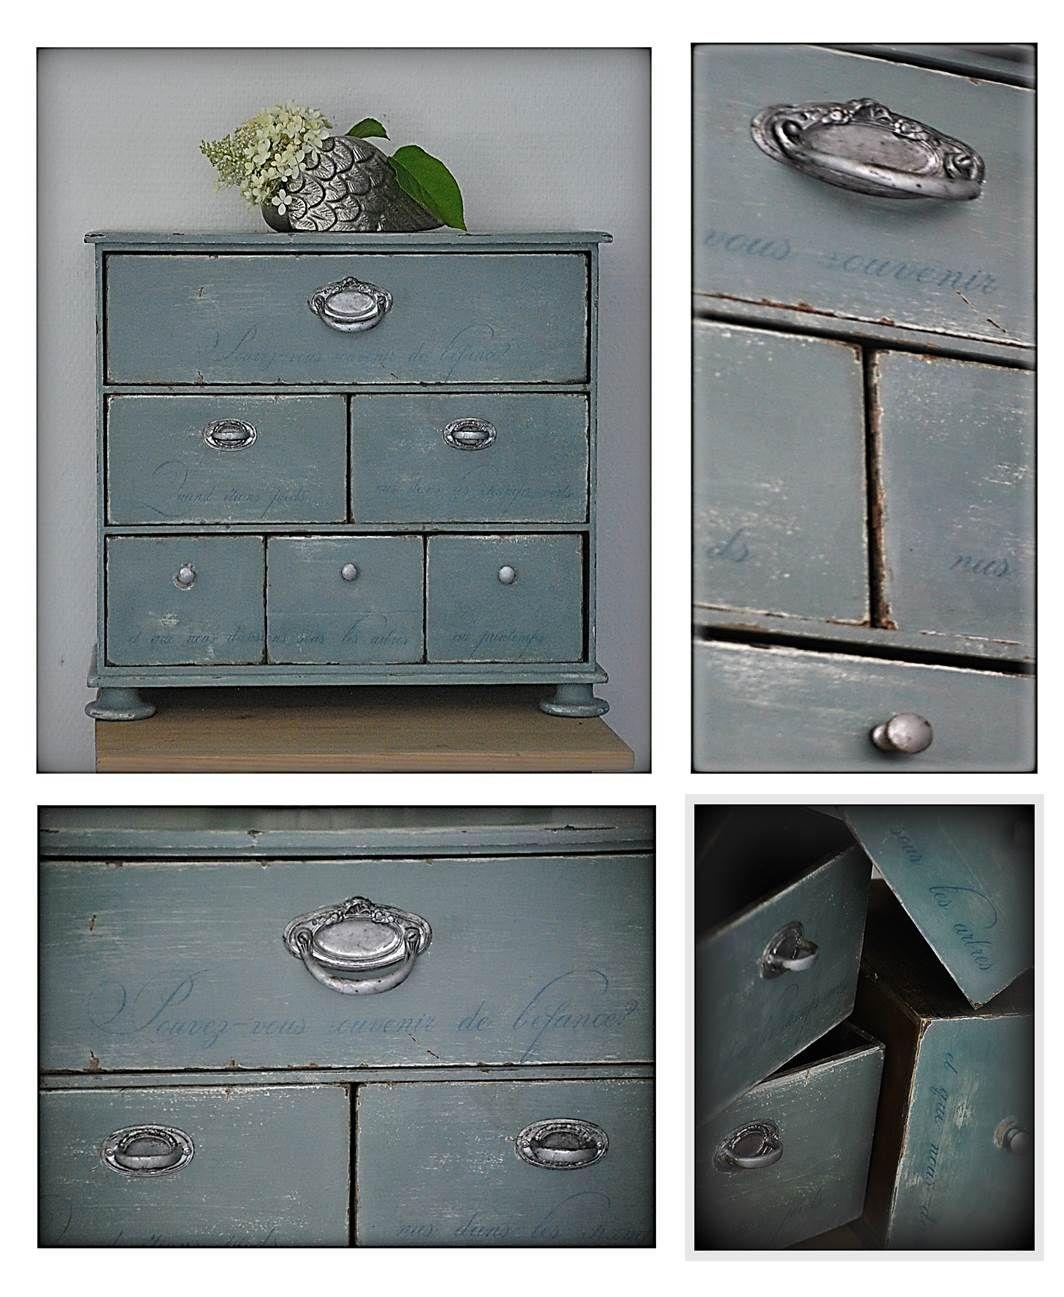 ikea hack moppe minikommode annie sloan chalk paint. Black Bedroom Furniture Sets. Home Design Ideas